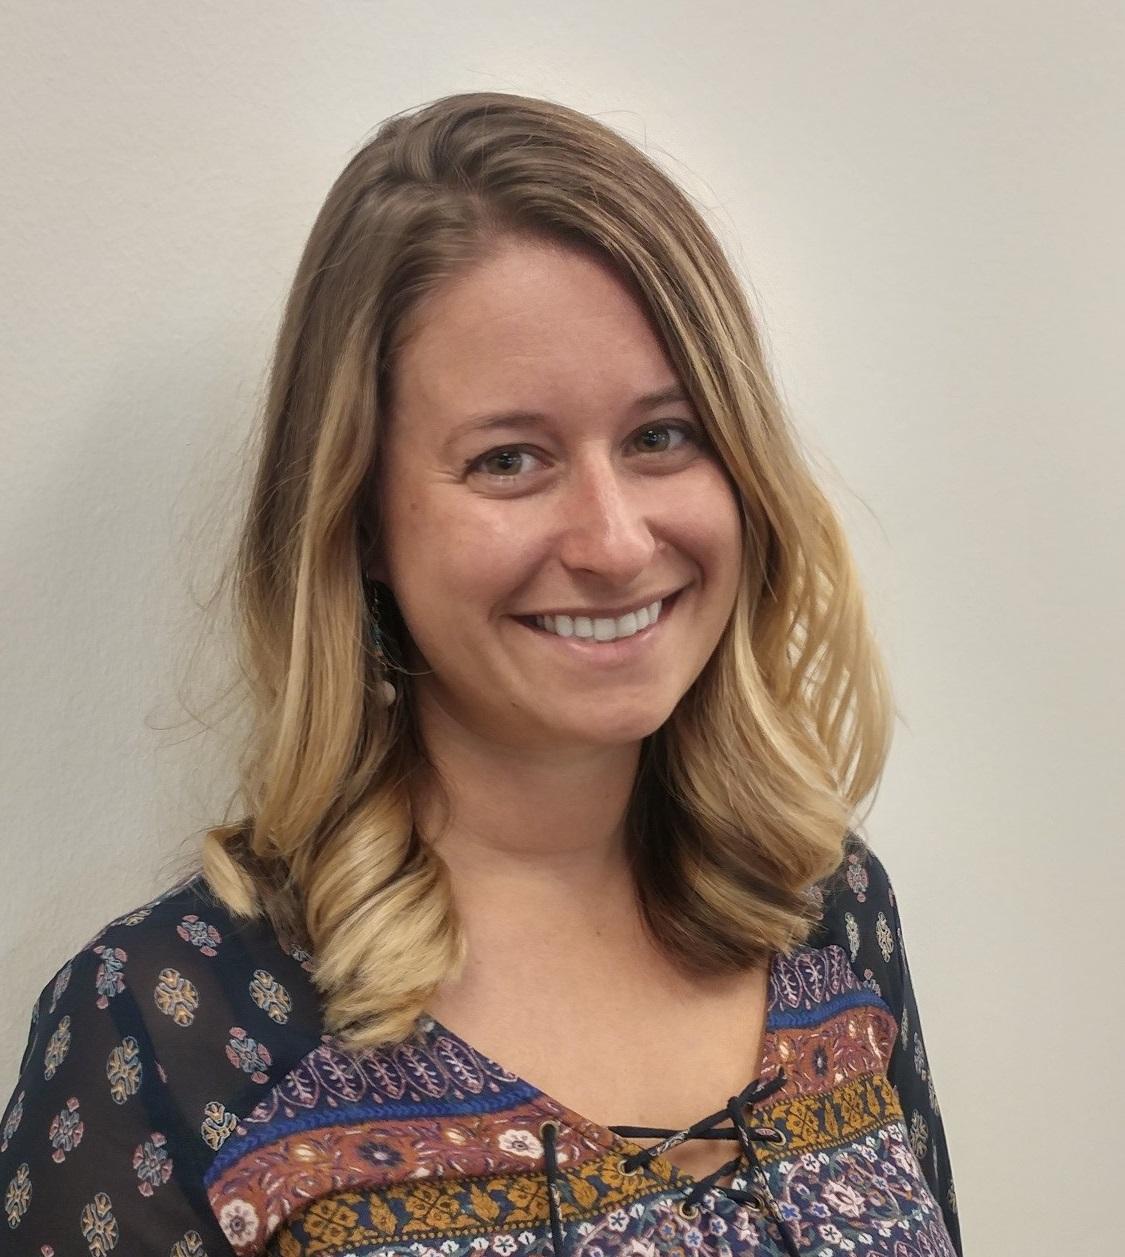 Angela Gallagher, Research Associate